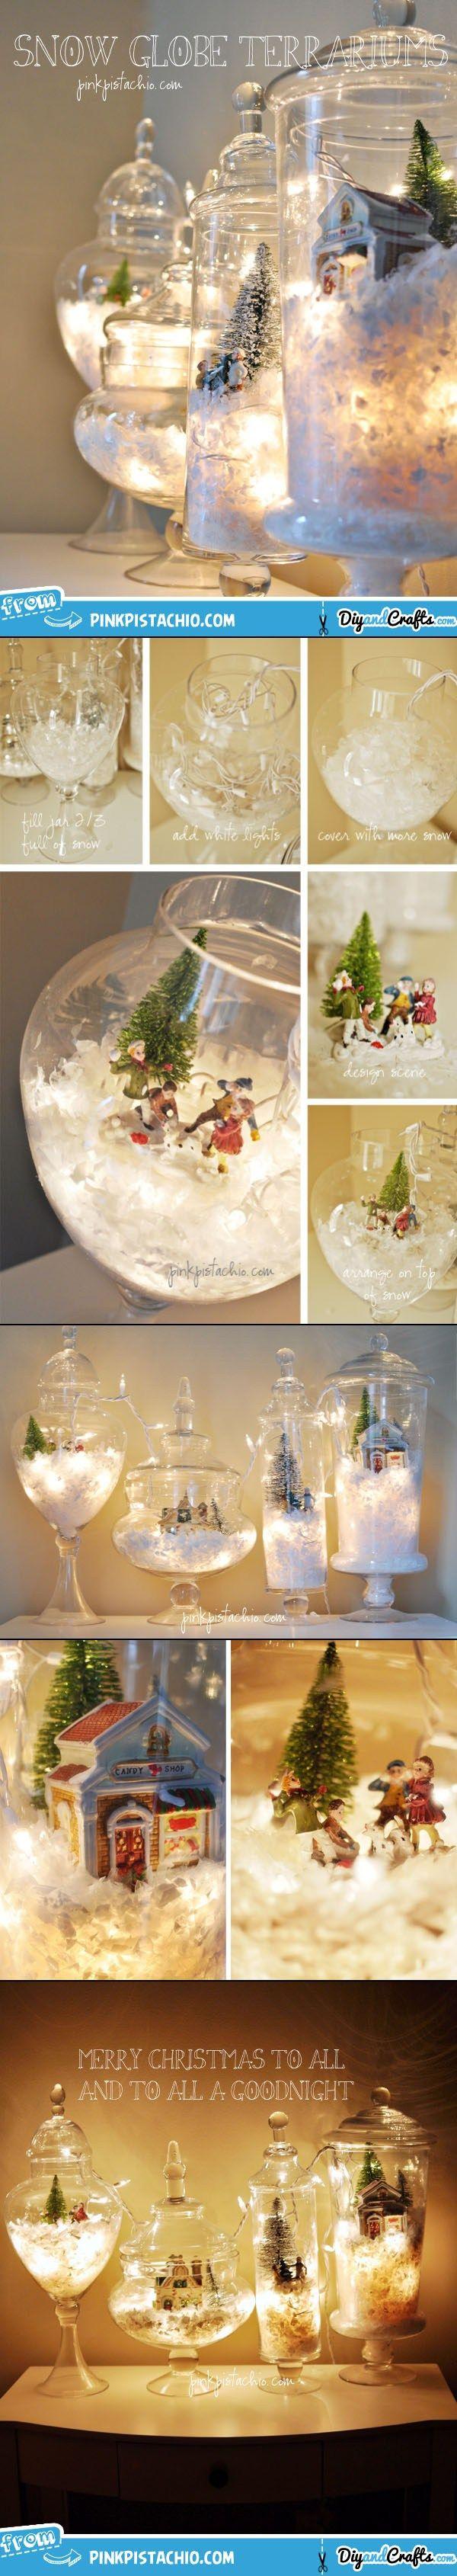 Snow globe terrariums diy diy u crafts christmas pinterest